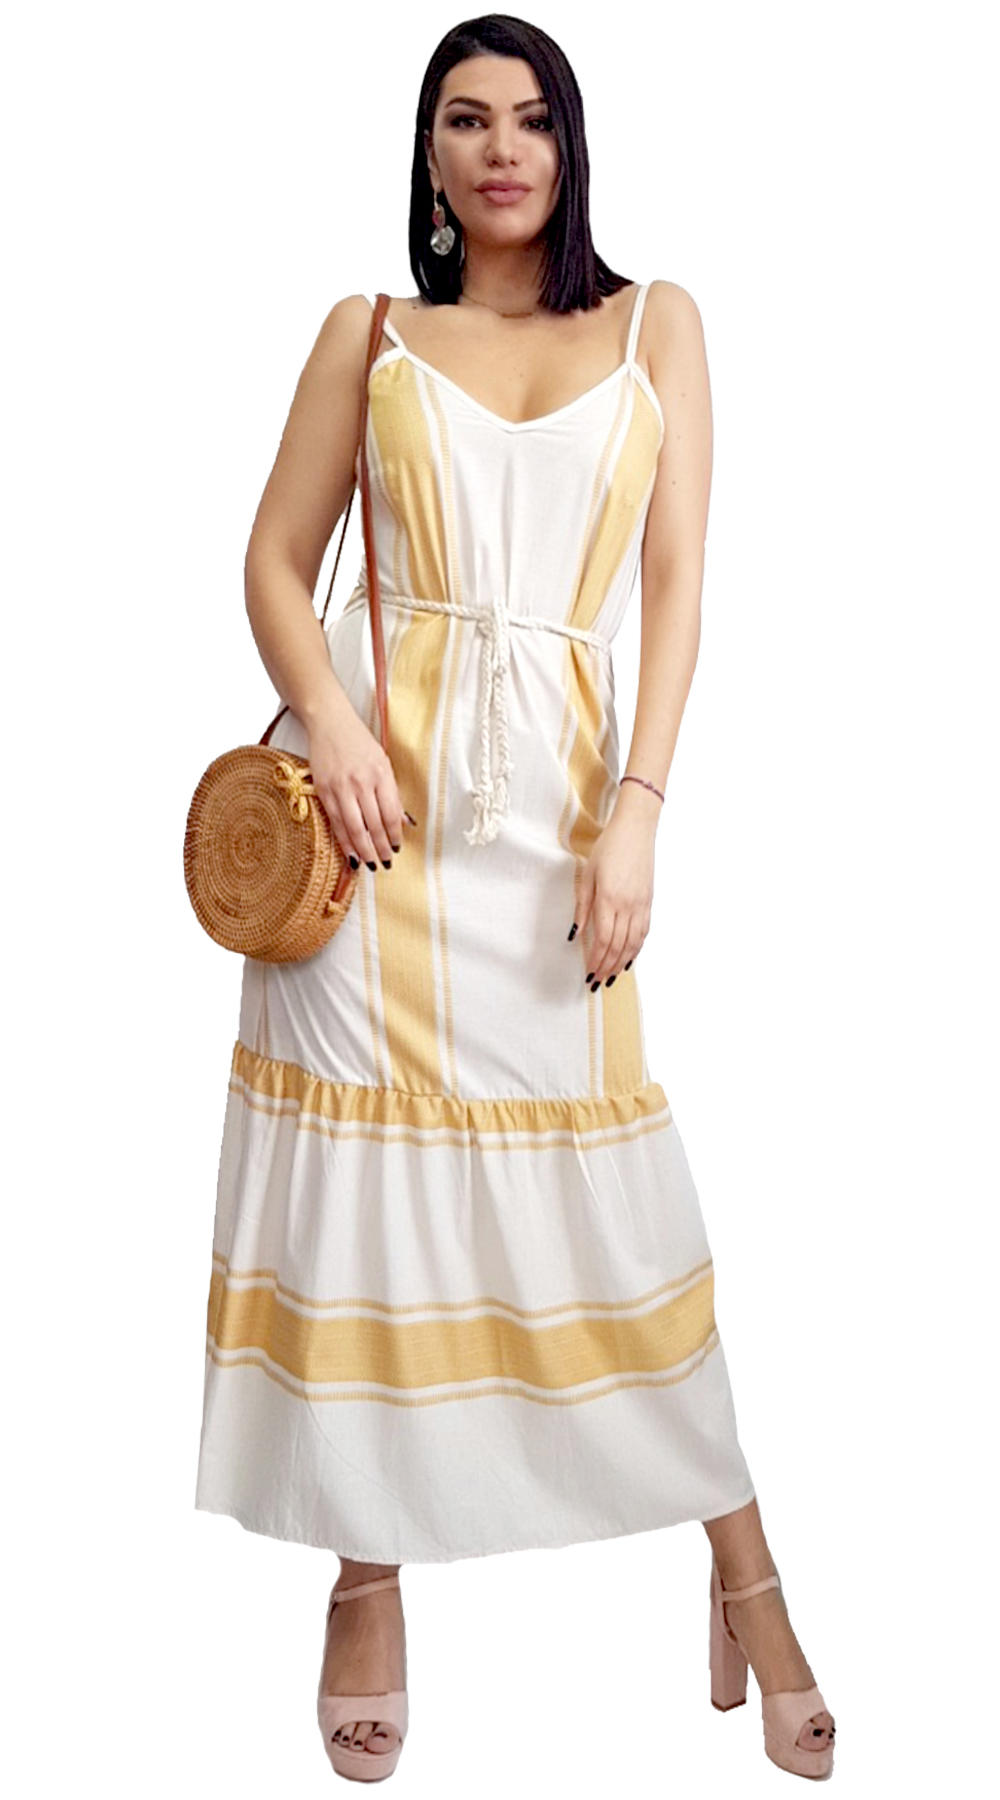 92e1d5b5da2f Boho Ριγέ Maxi Φόρεμα